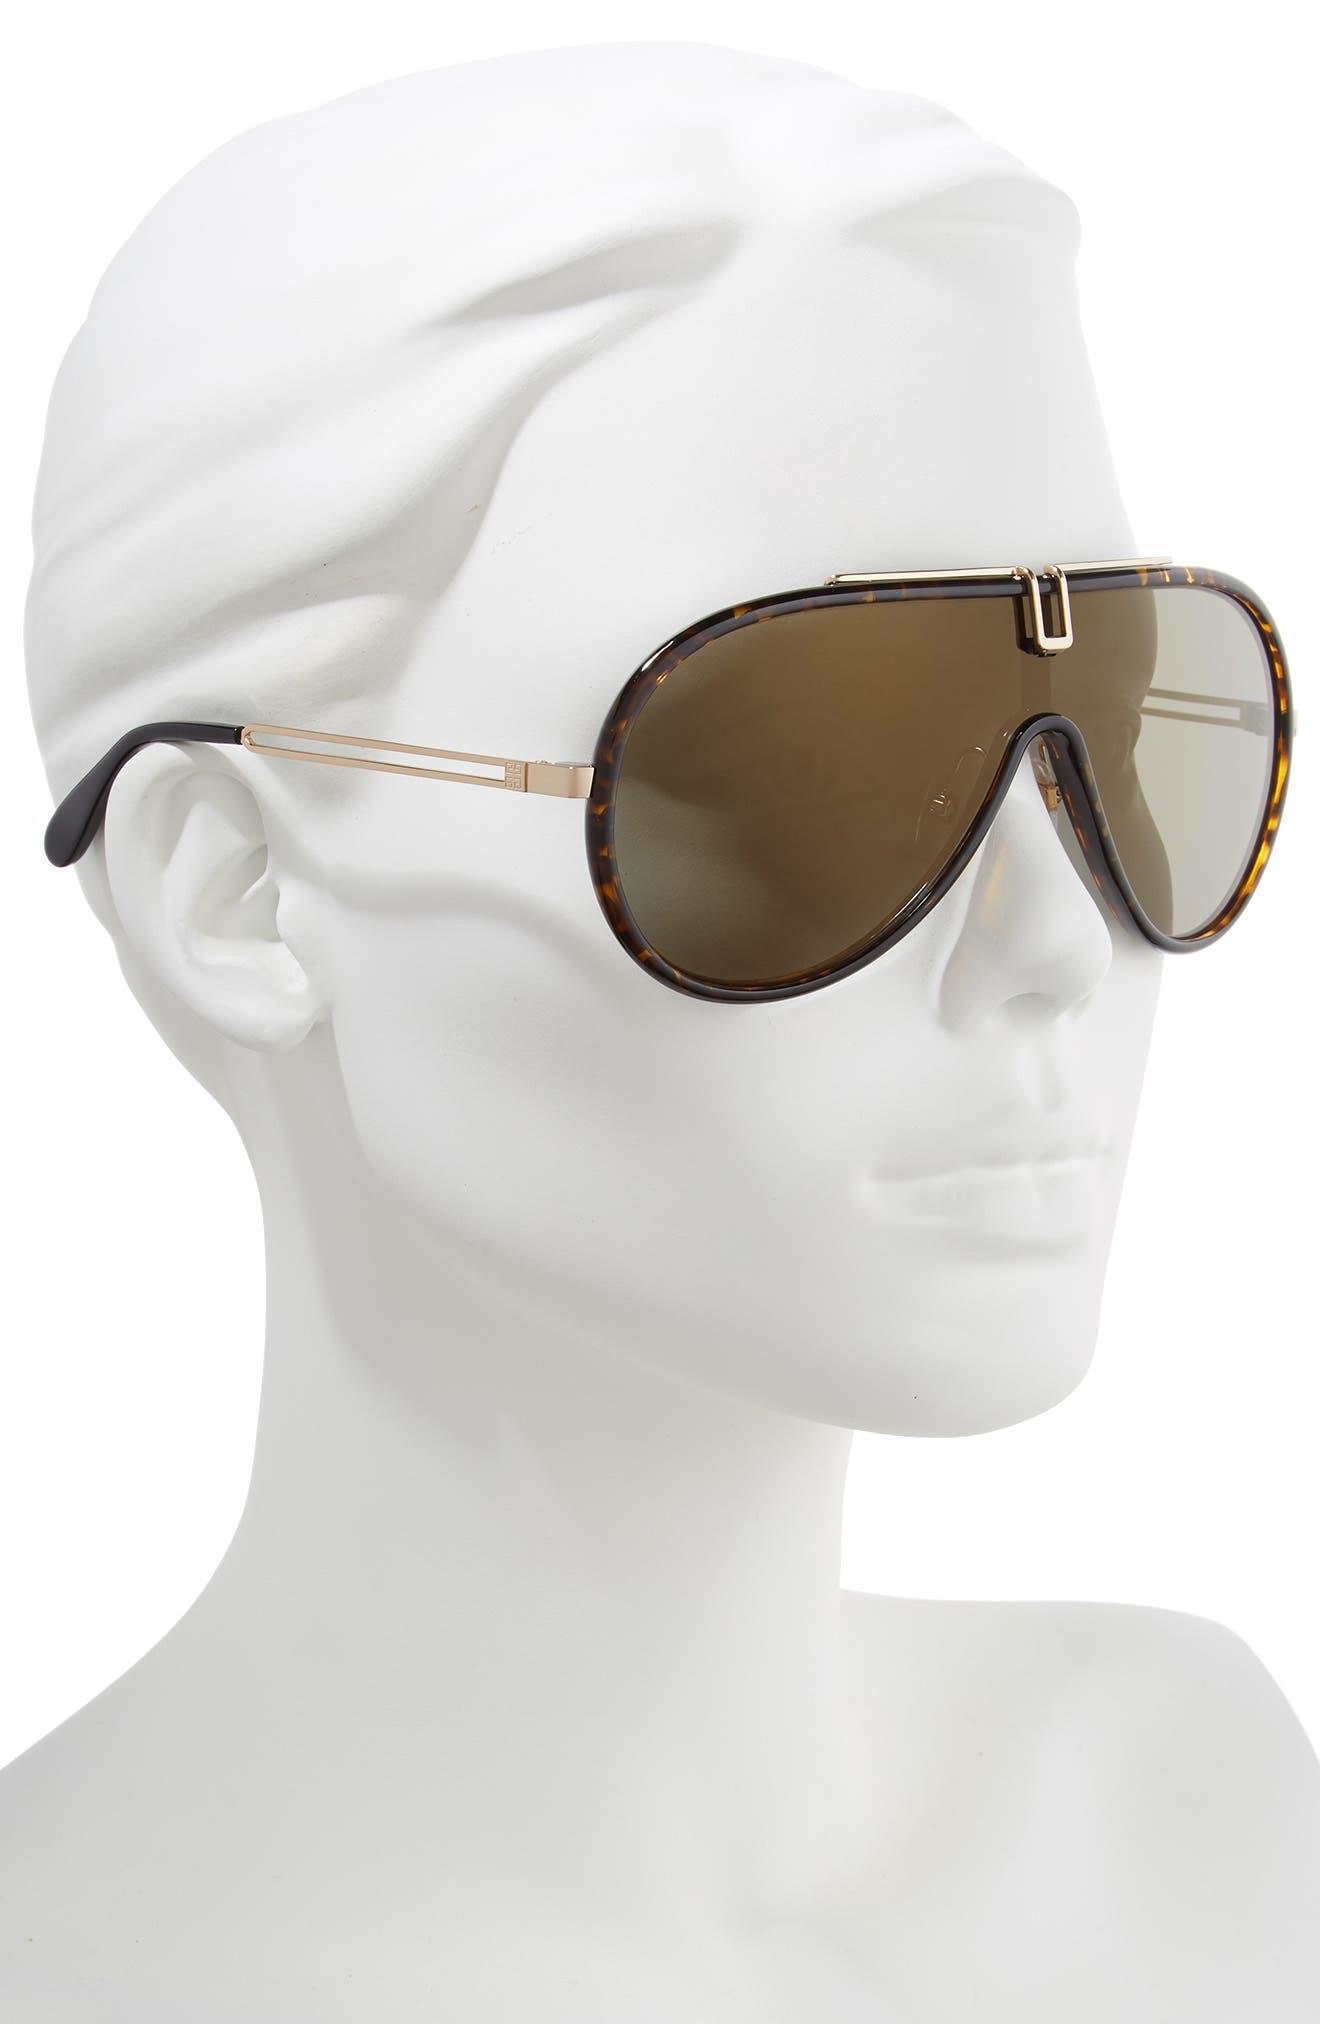 99mm Shield Sunglasses,                             Alternate thumbnail 2, color,                             DARK HAVANA